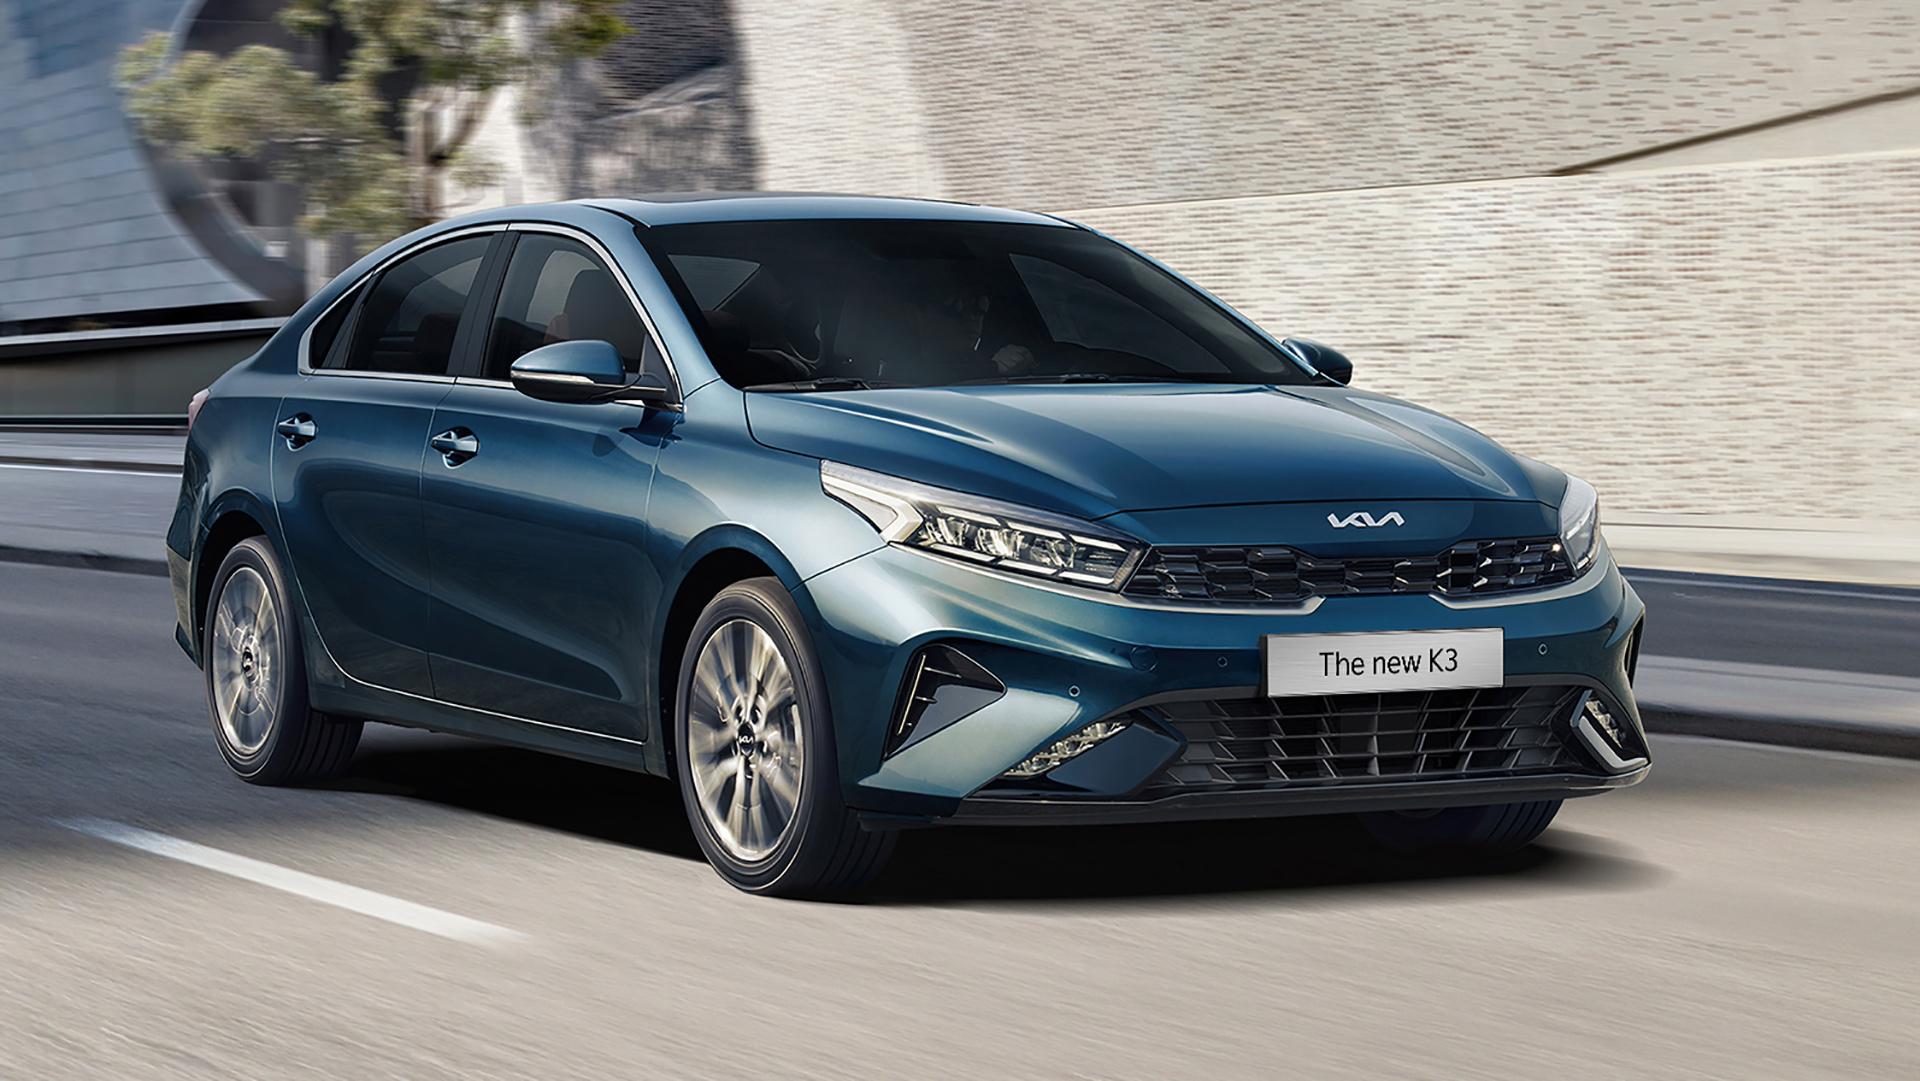 Kia K3 2021 chính thức ra mắt, giá từ 559 triệu kia-k3.jpg